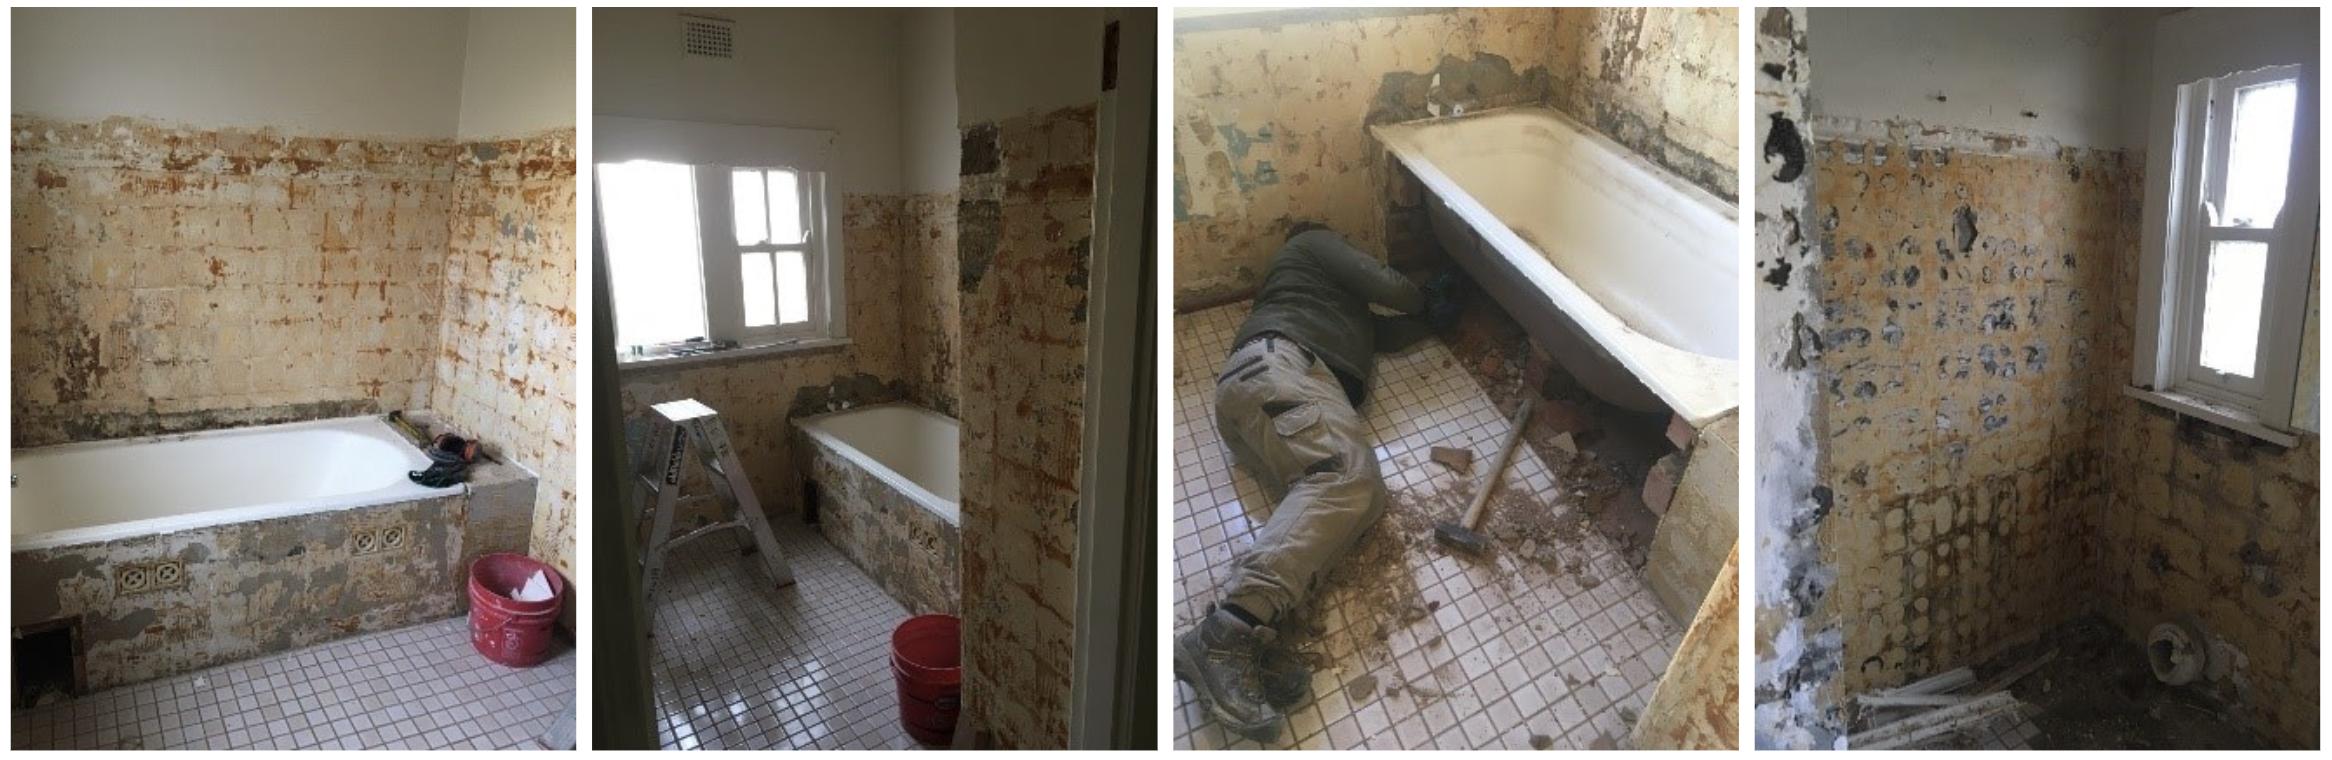 journey-home-interiors-forrest-demolition-1930s-bathroom-remodel-after-demo-bathtub-without-tiles